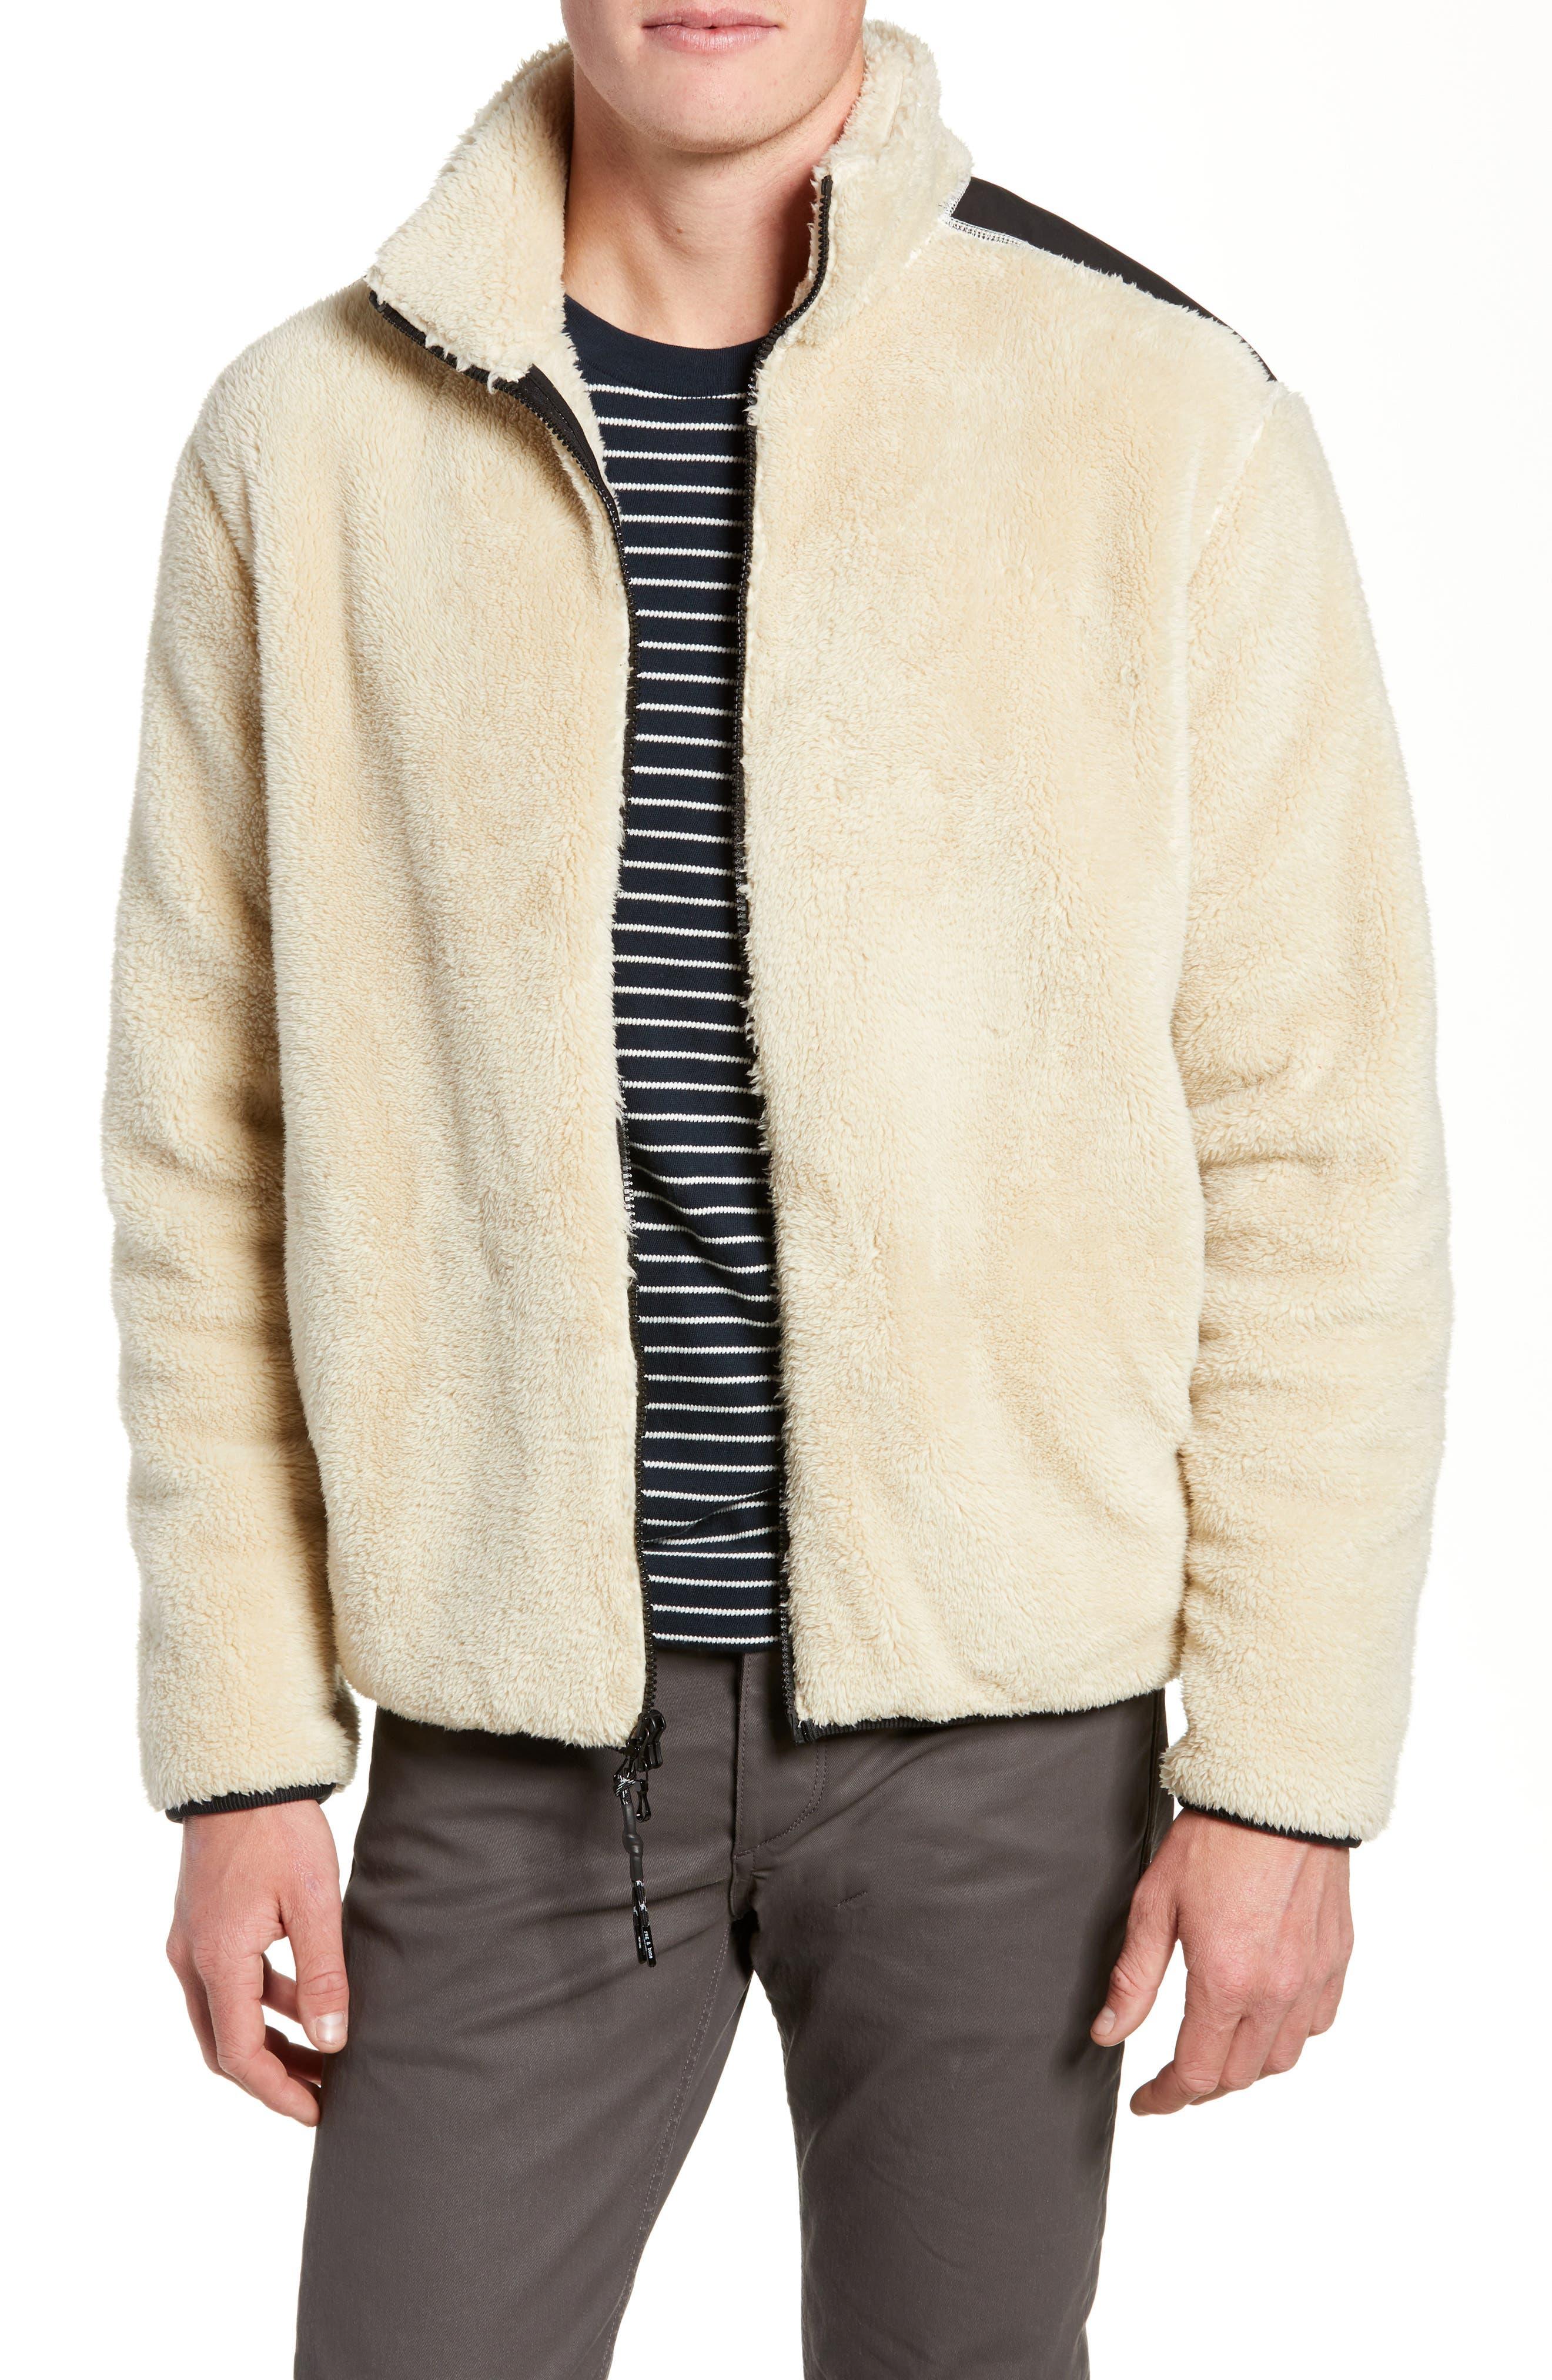 Rag & Bone Regular Fit Fleece Jacket